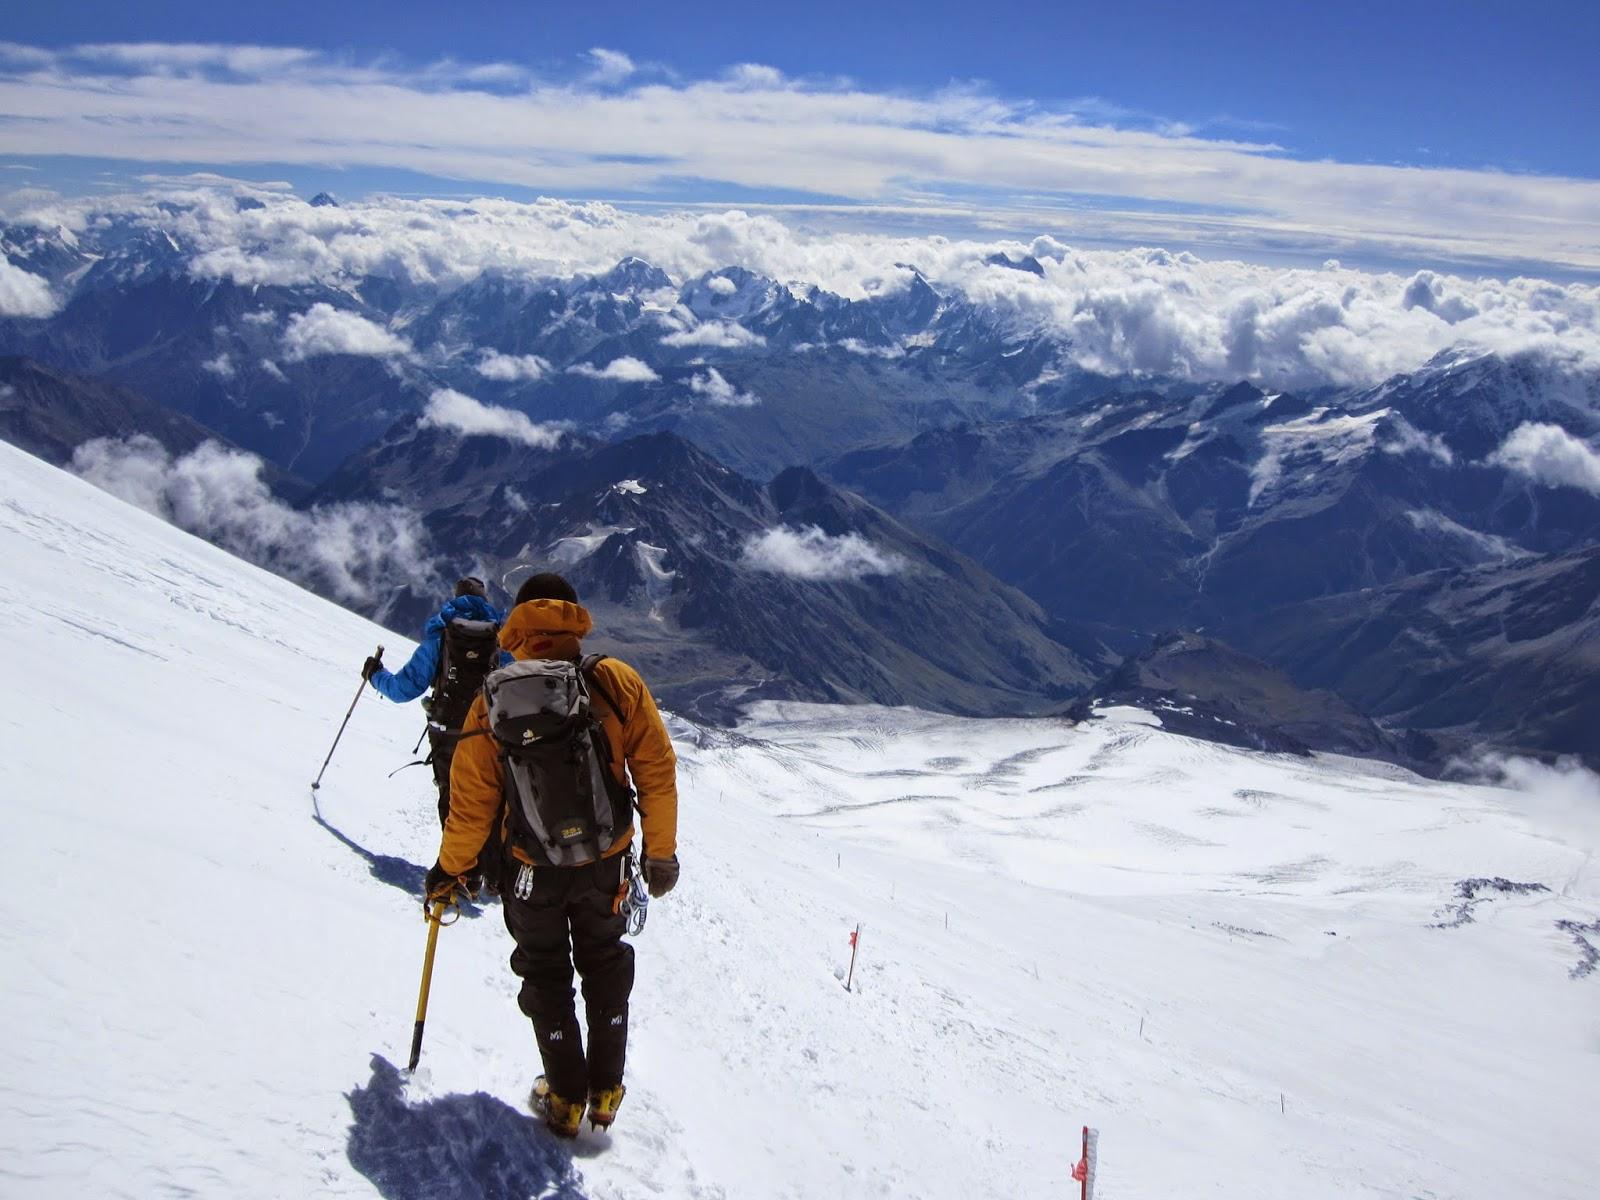 Amazing views of the Caucasus Mountains below us as we are descending Mount Elbrus